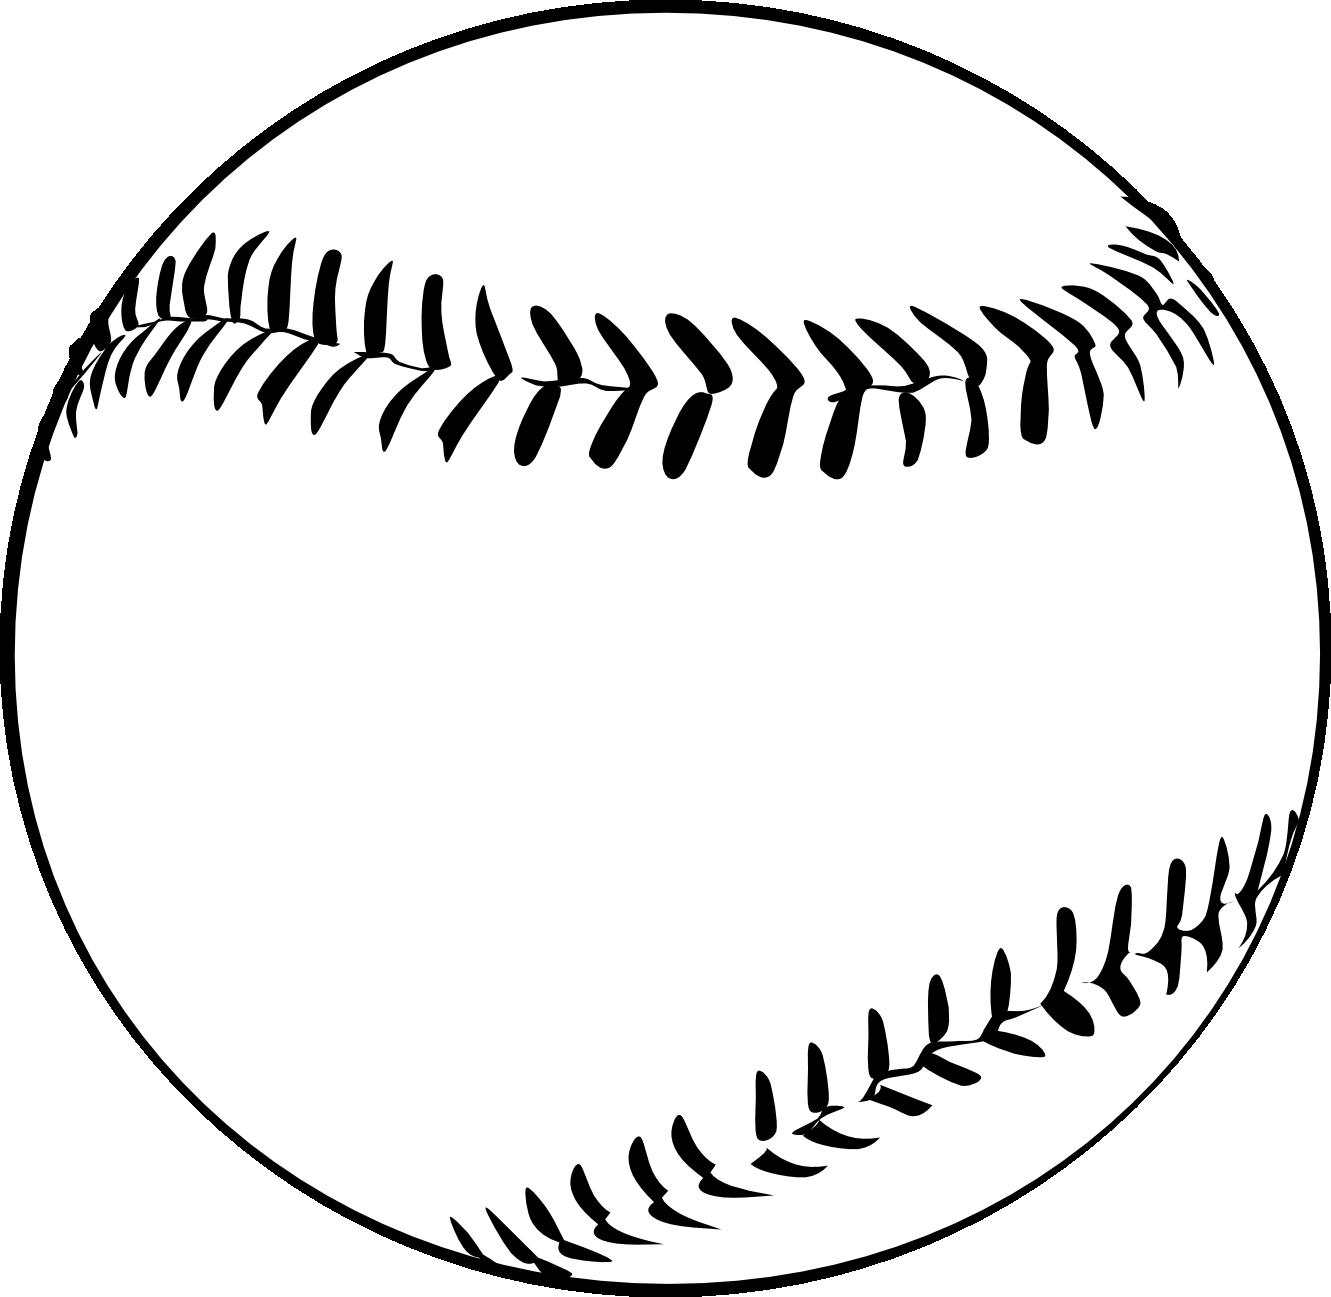 baseball clipart black and white